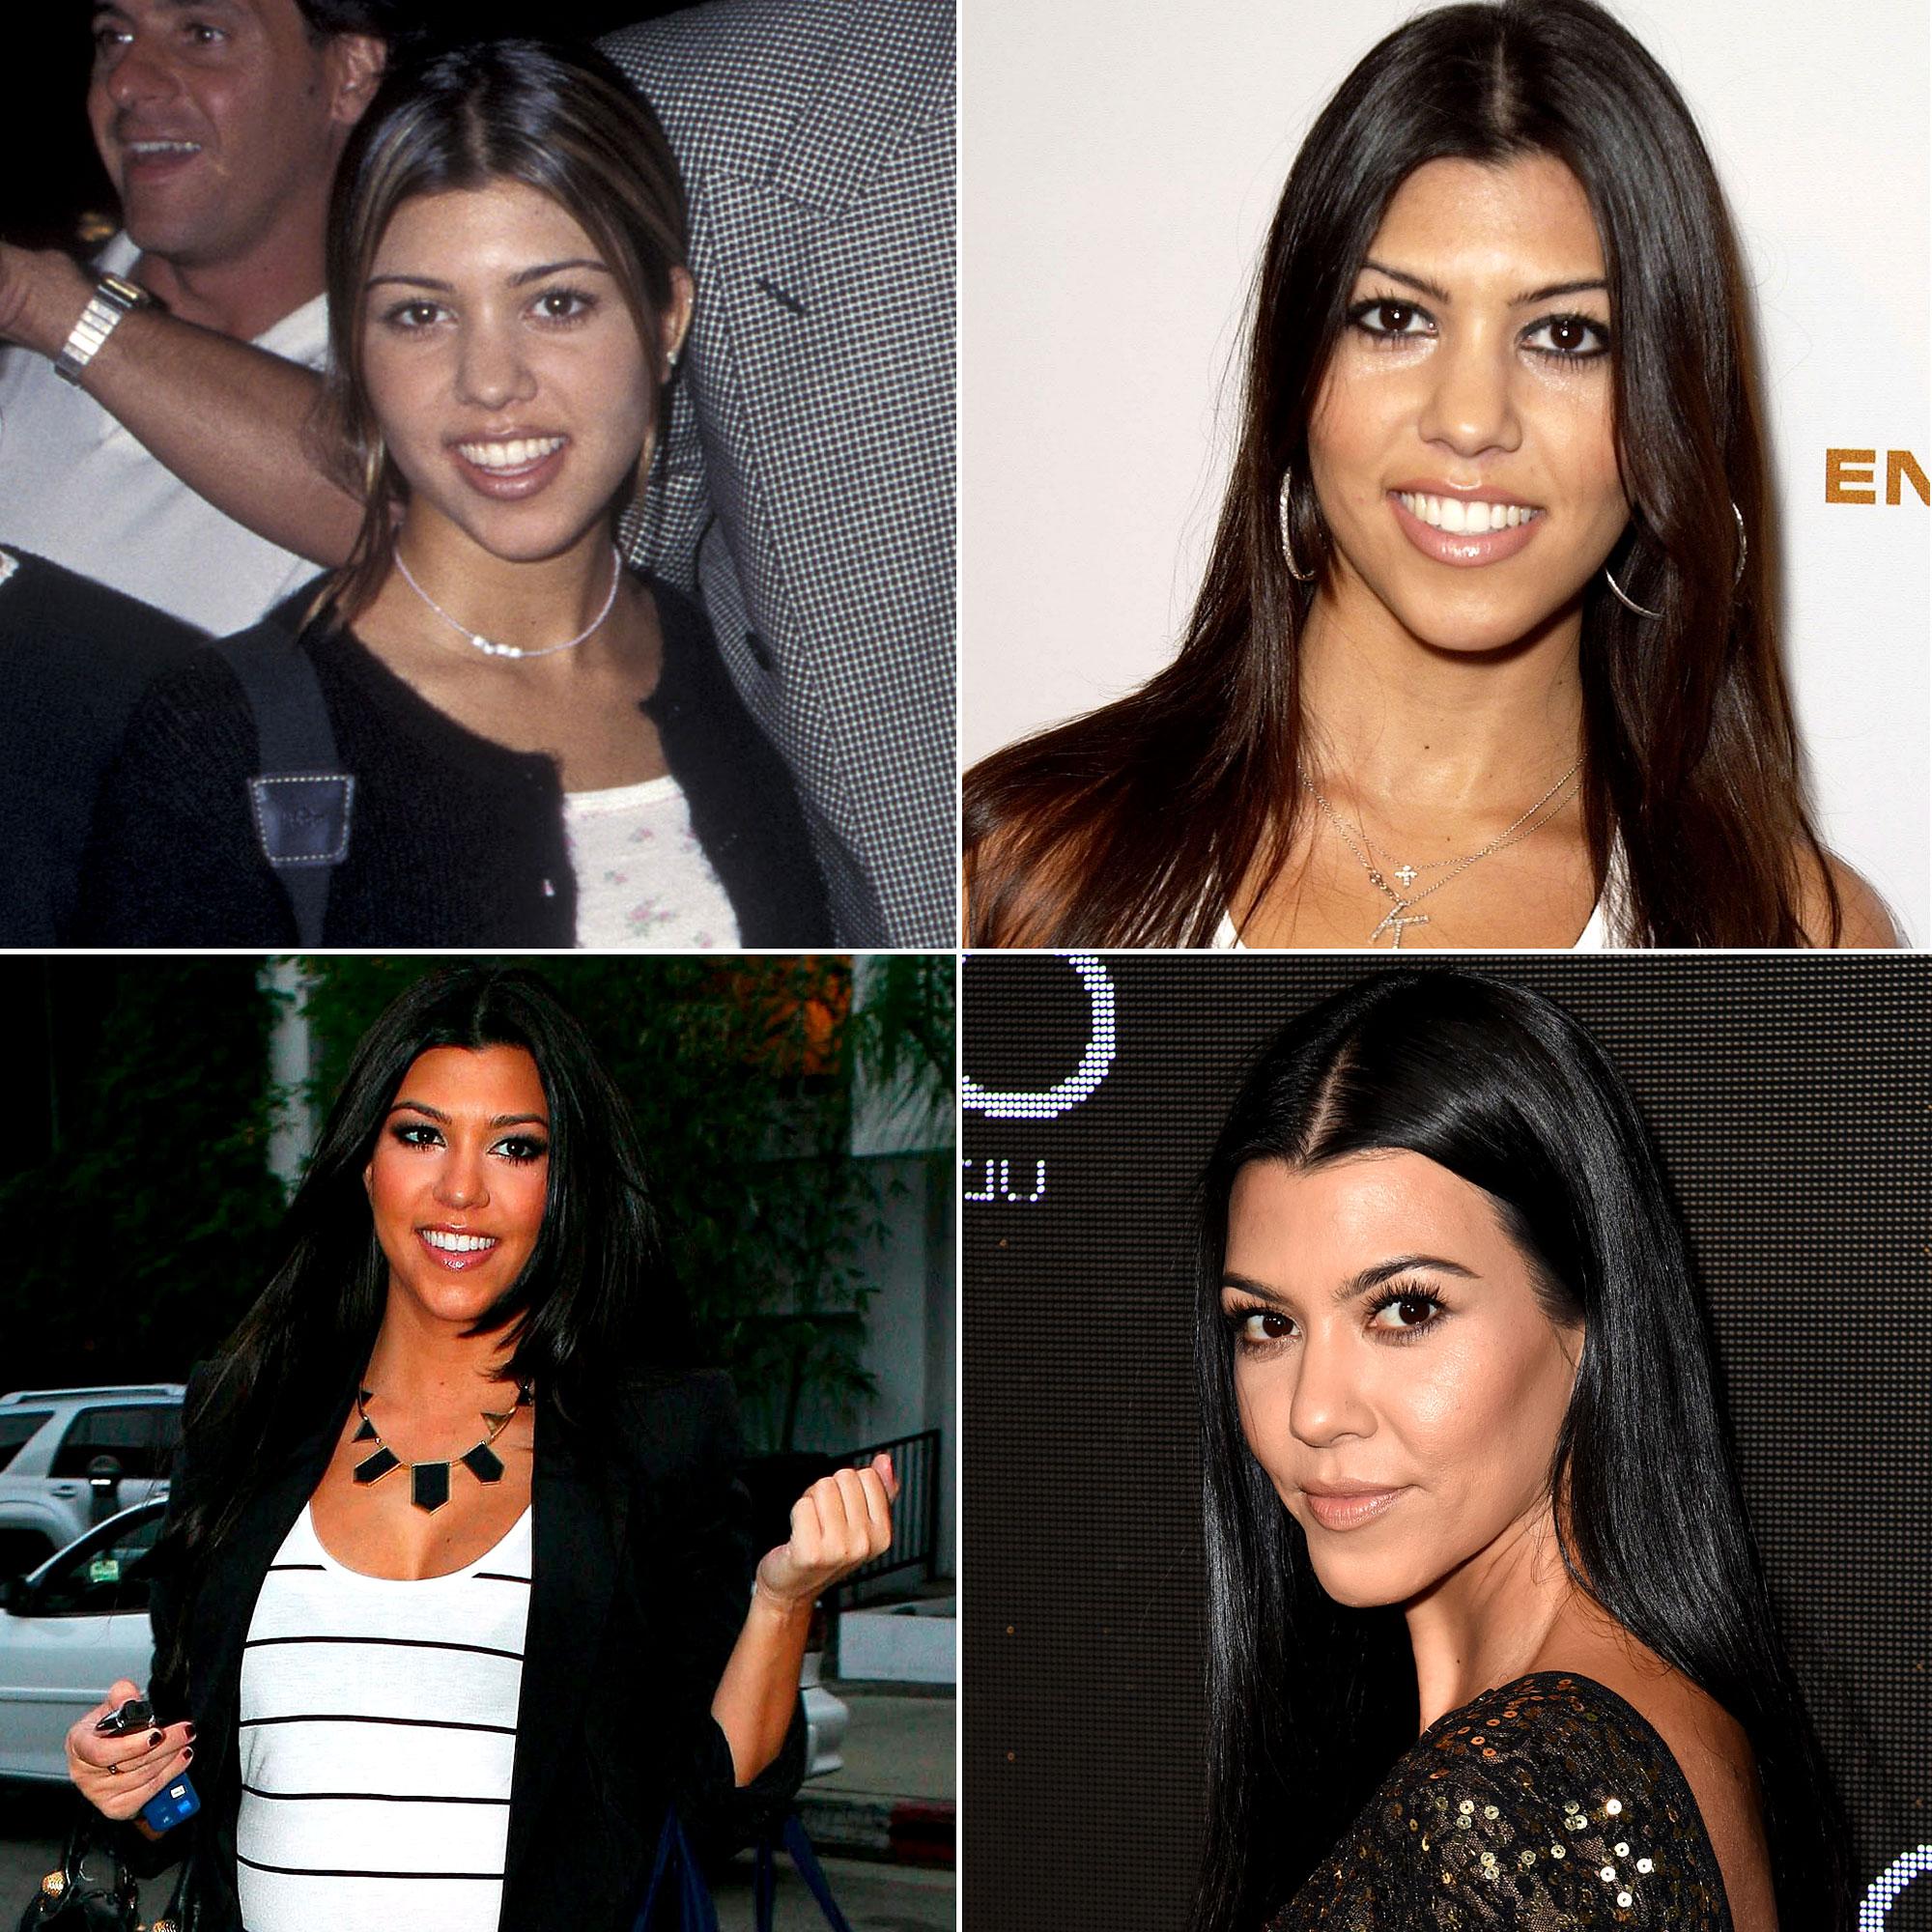 Kourtney Kardashian Through the Years - Hotter than ever. Kourtney Kardashian has been making headlines for more than a decade alongside her famous family.